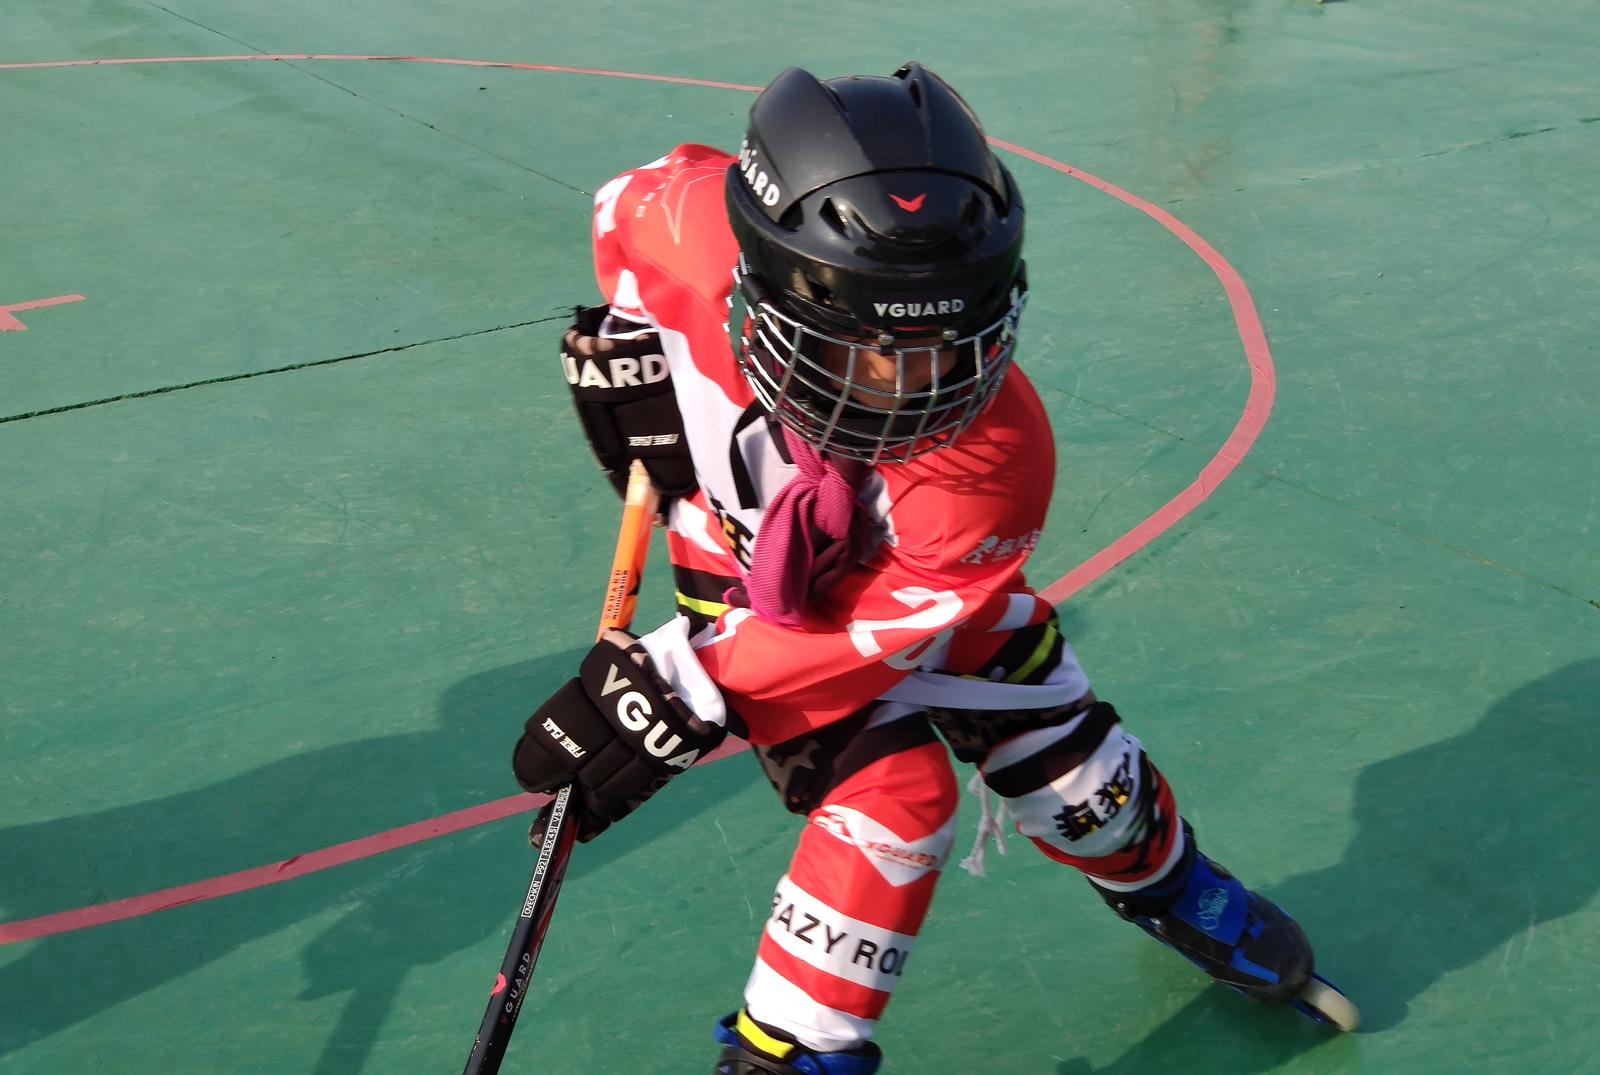 VGUARD威德冰球护具、头盔和球杆